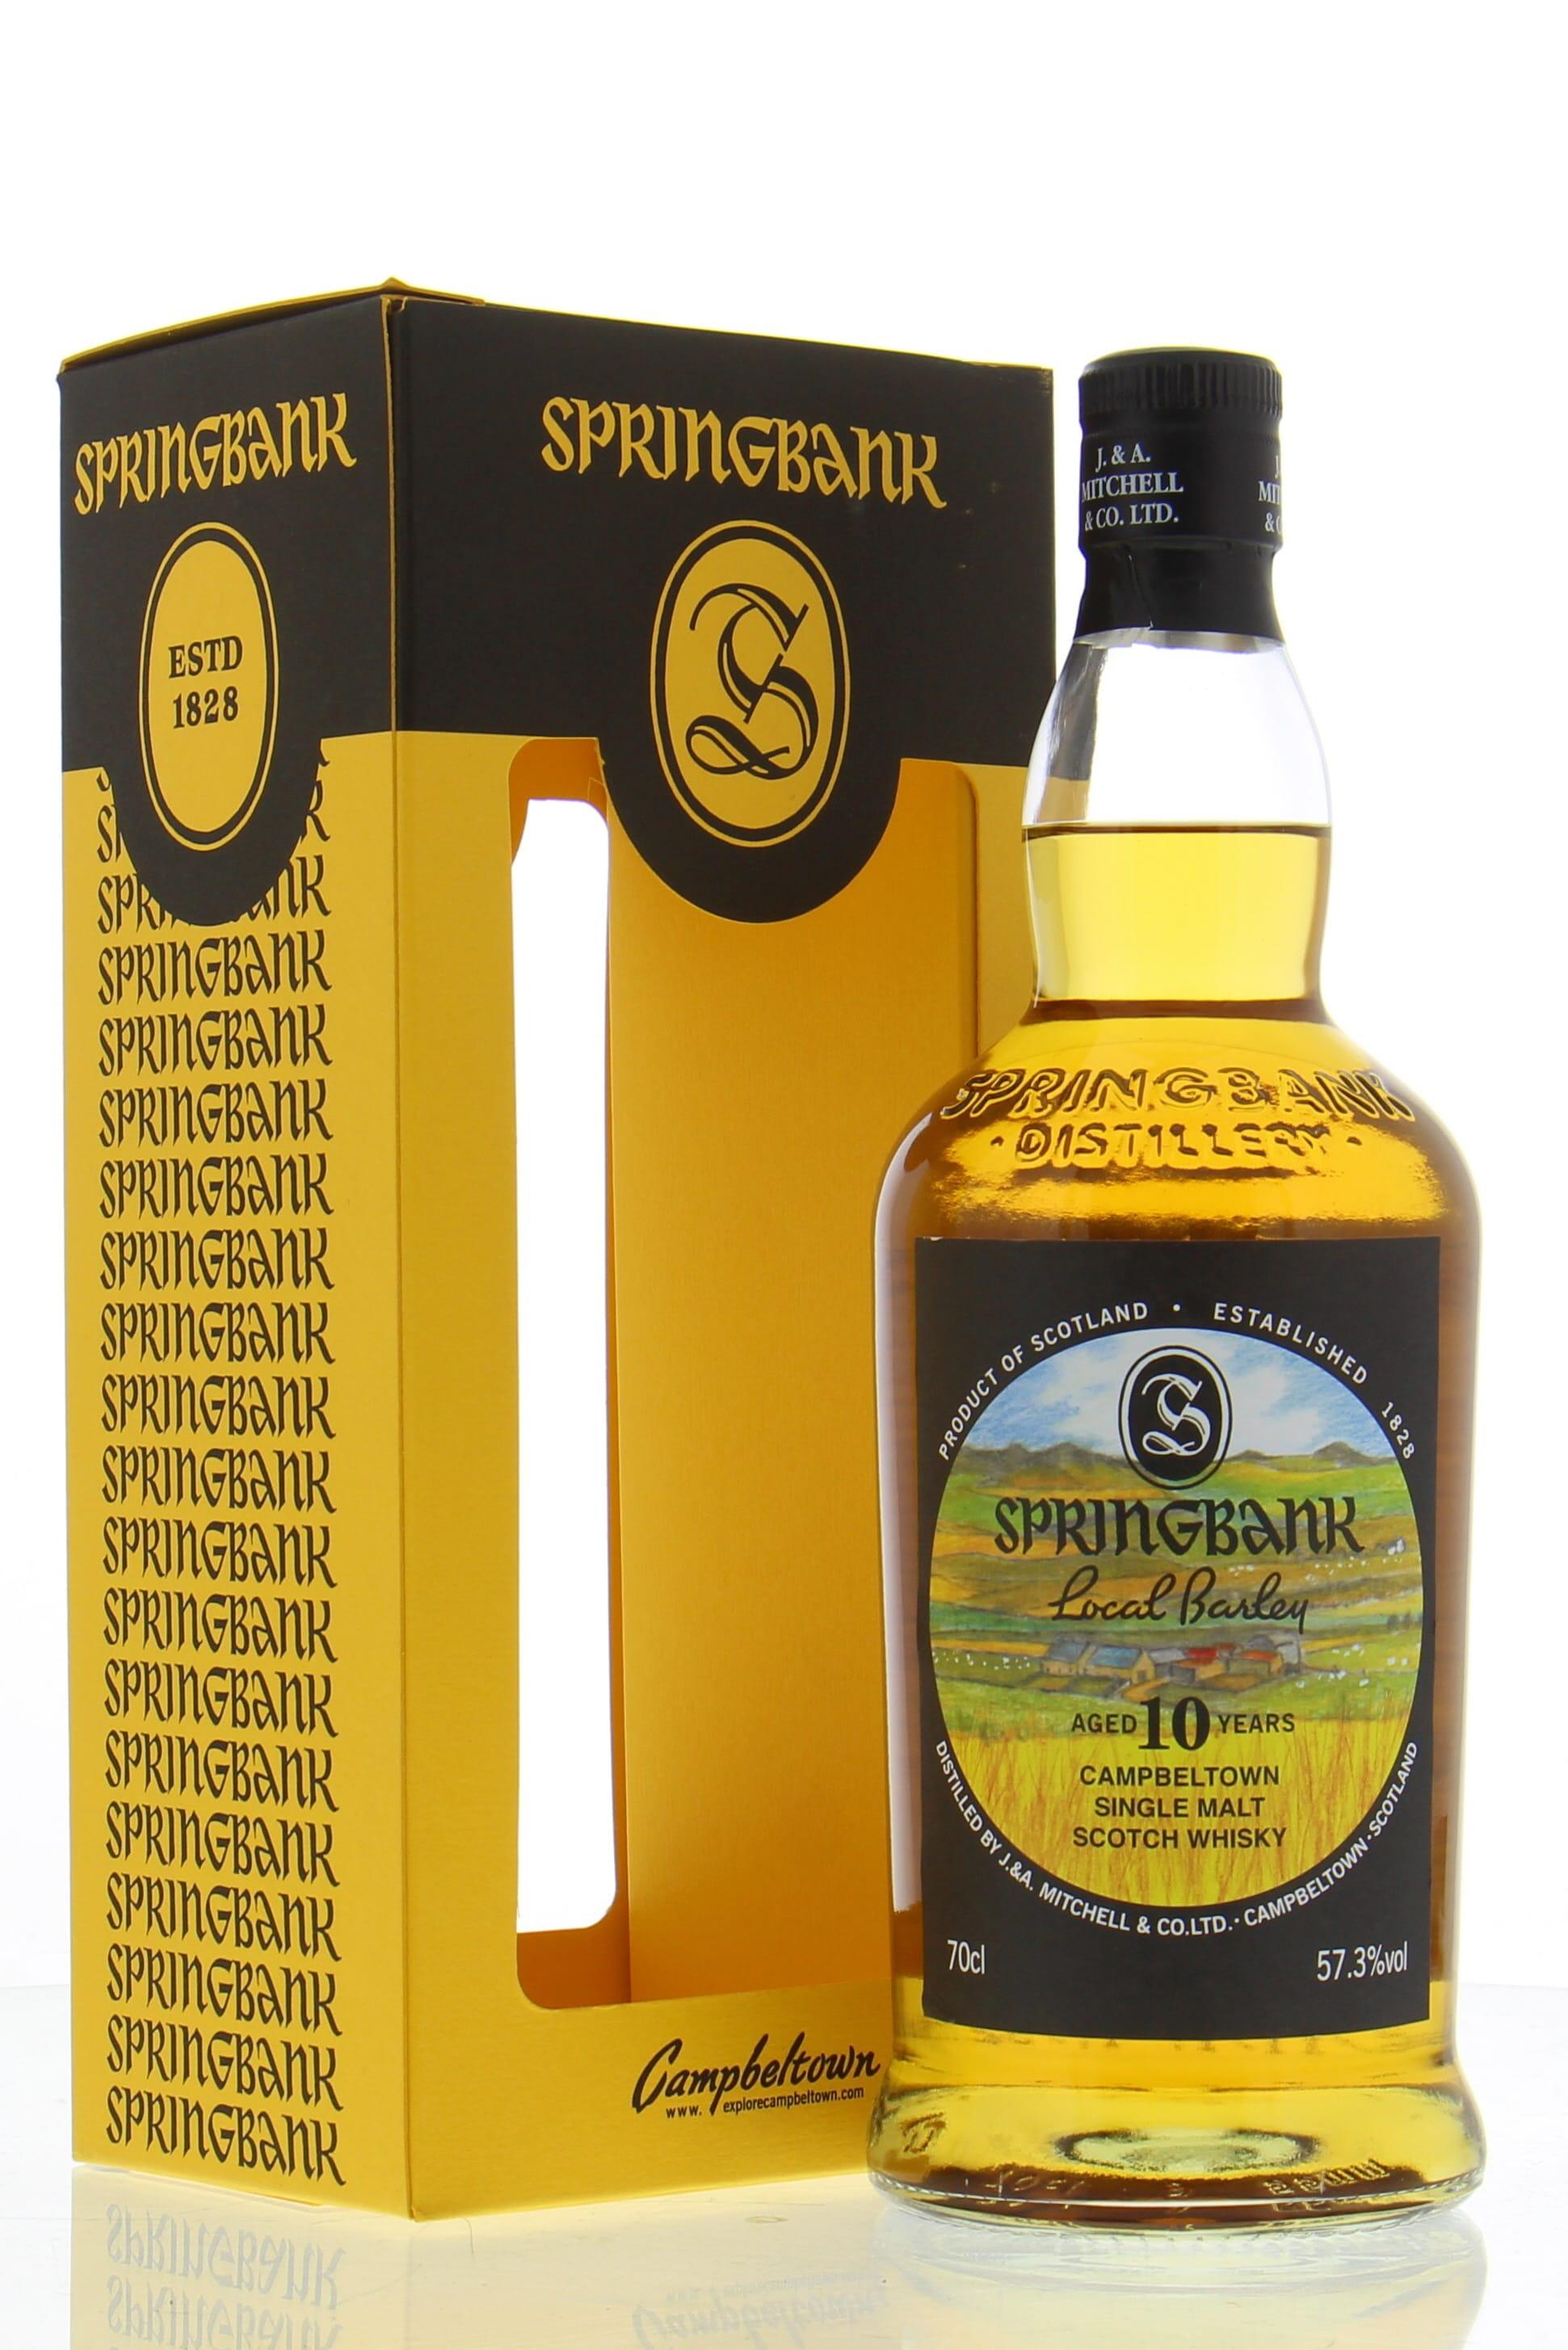 Springbank 10 Years Old Local Barley 57.3% 2007 (0.7 l ...